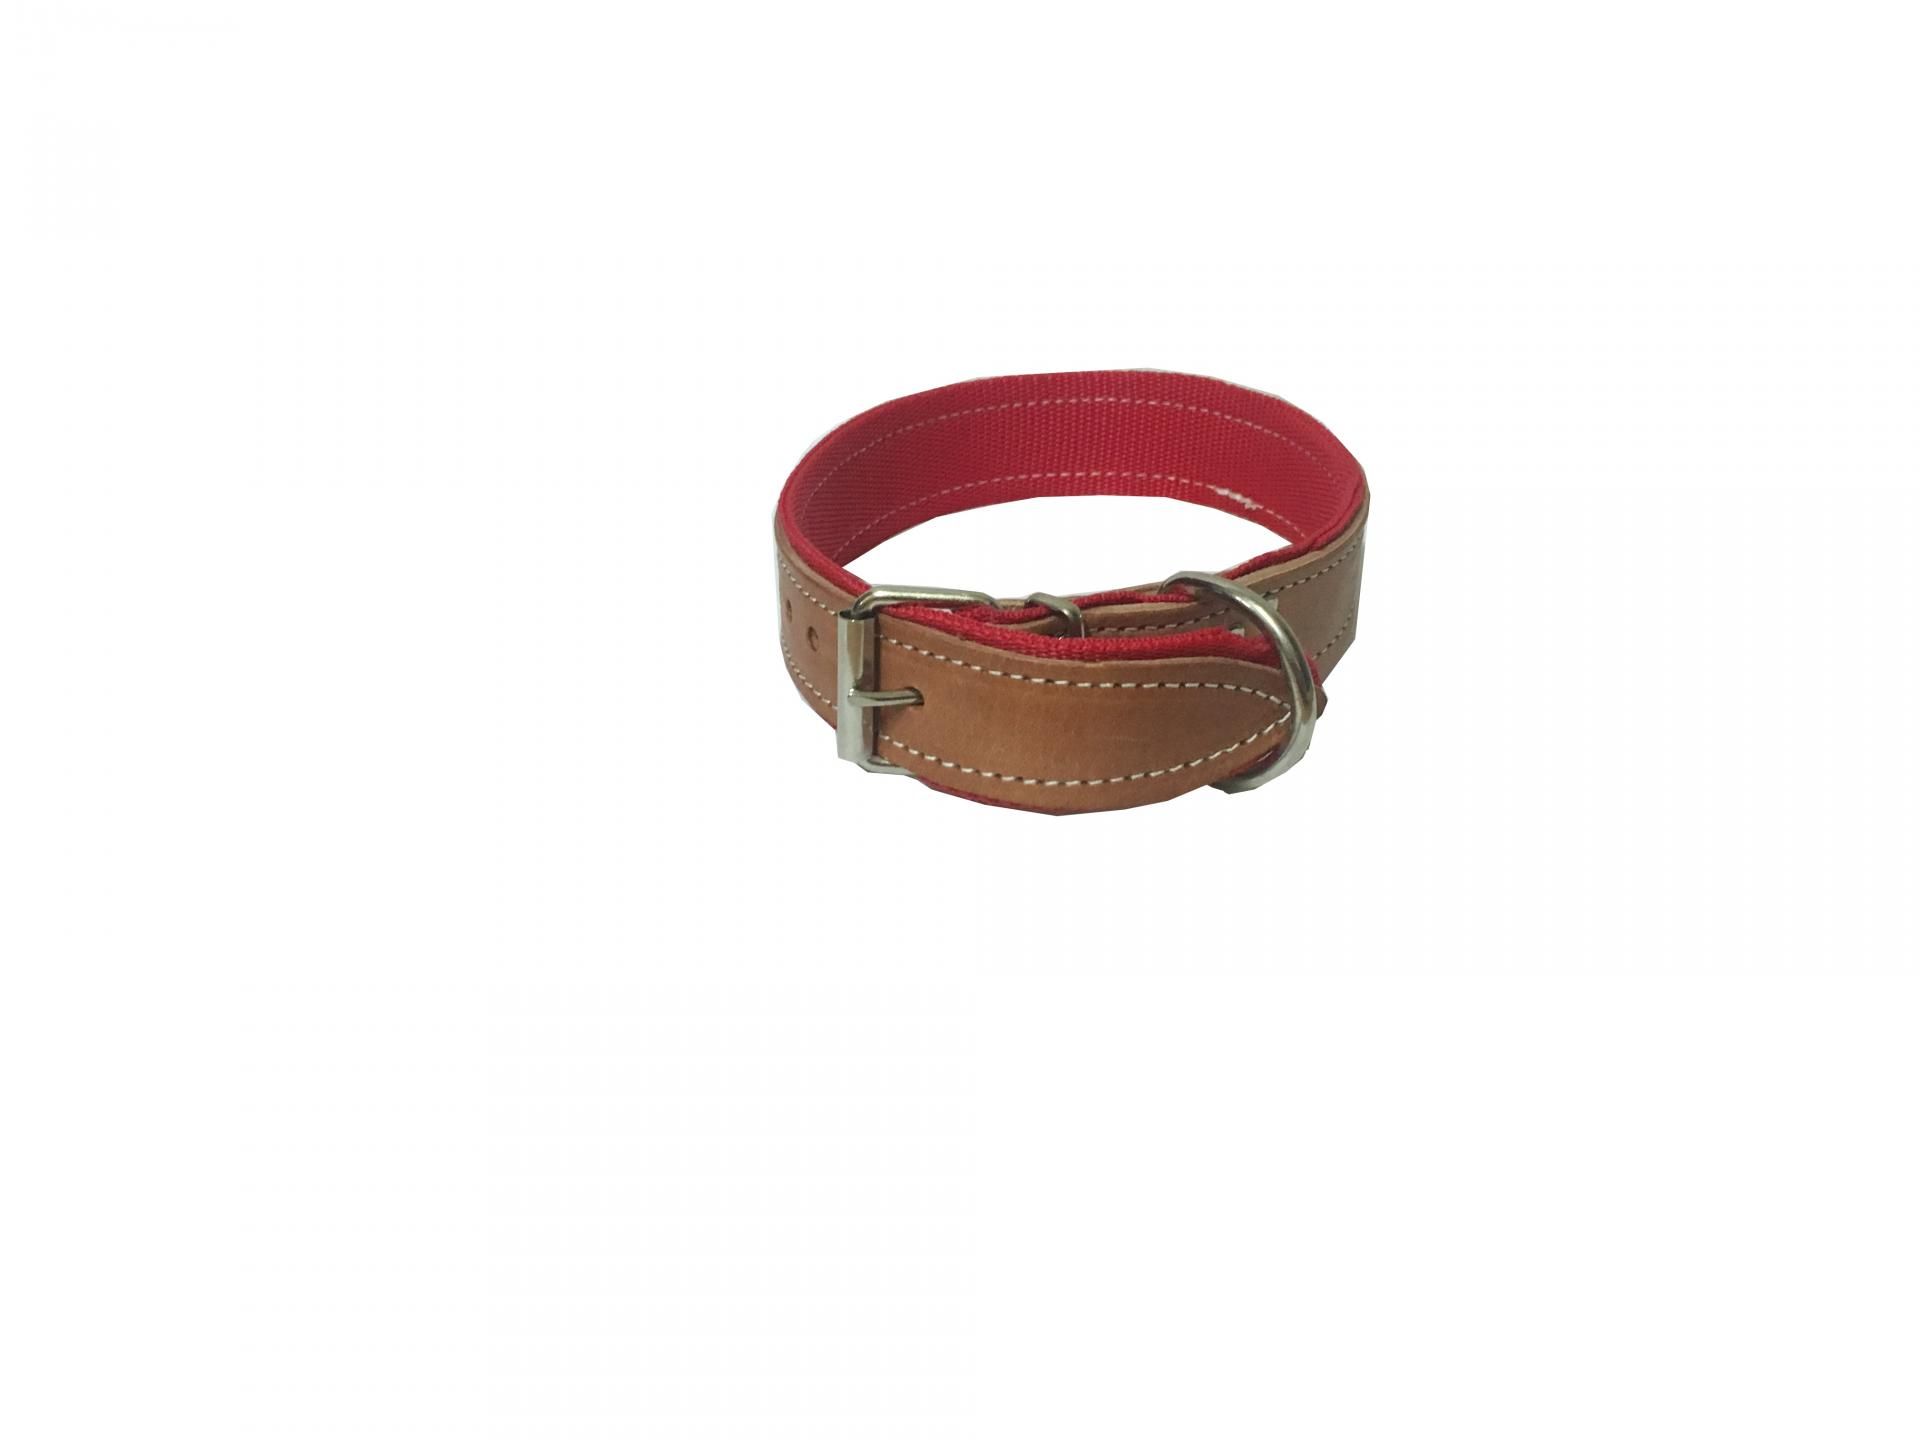 Collar perro cuero y nylon 75 cm x 4 cm